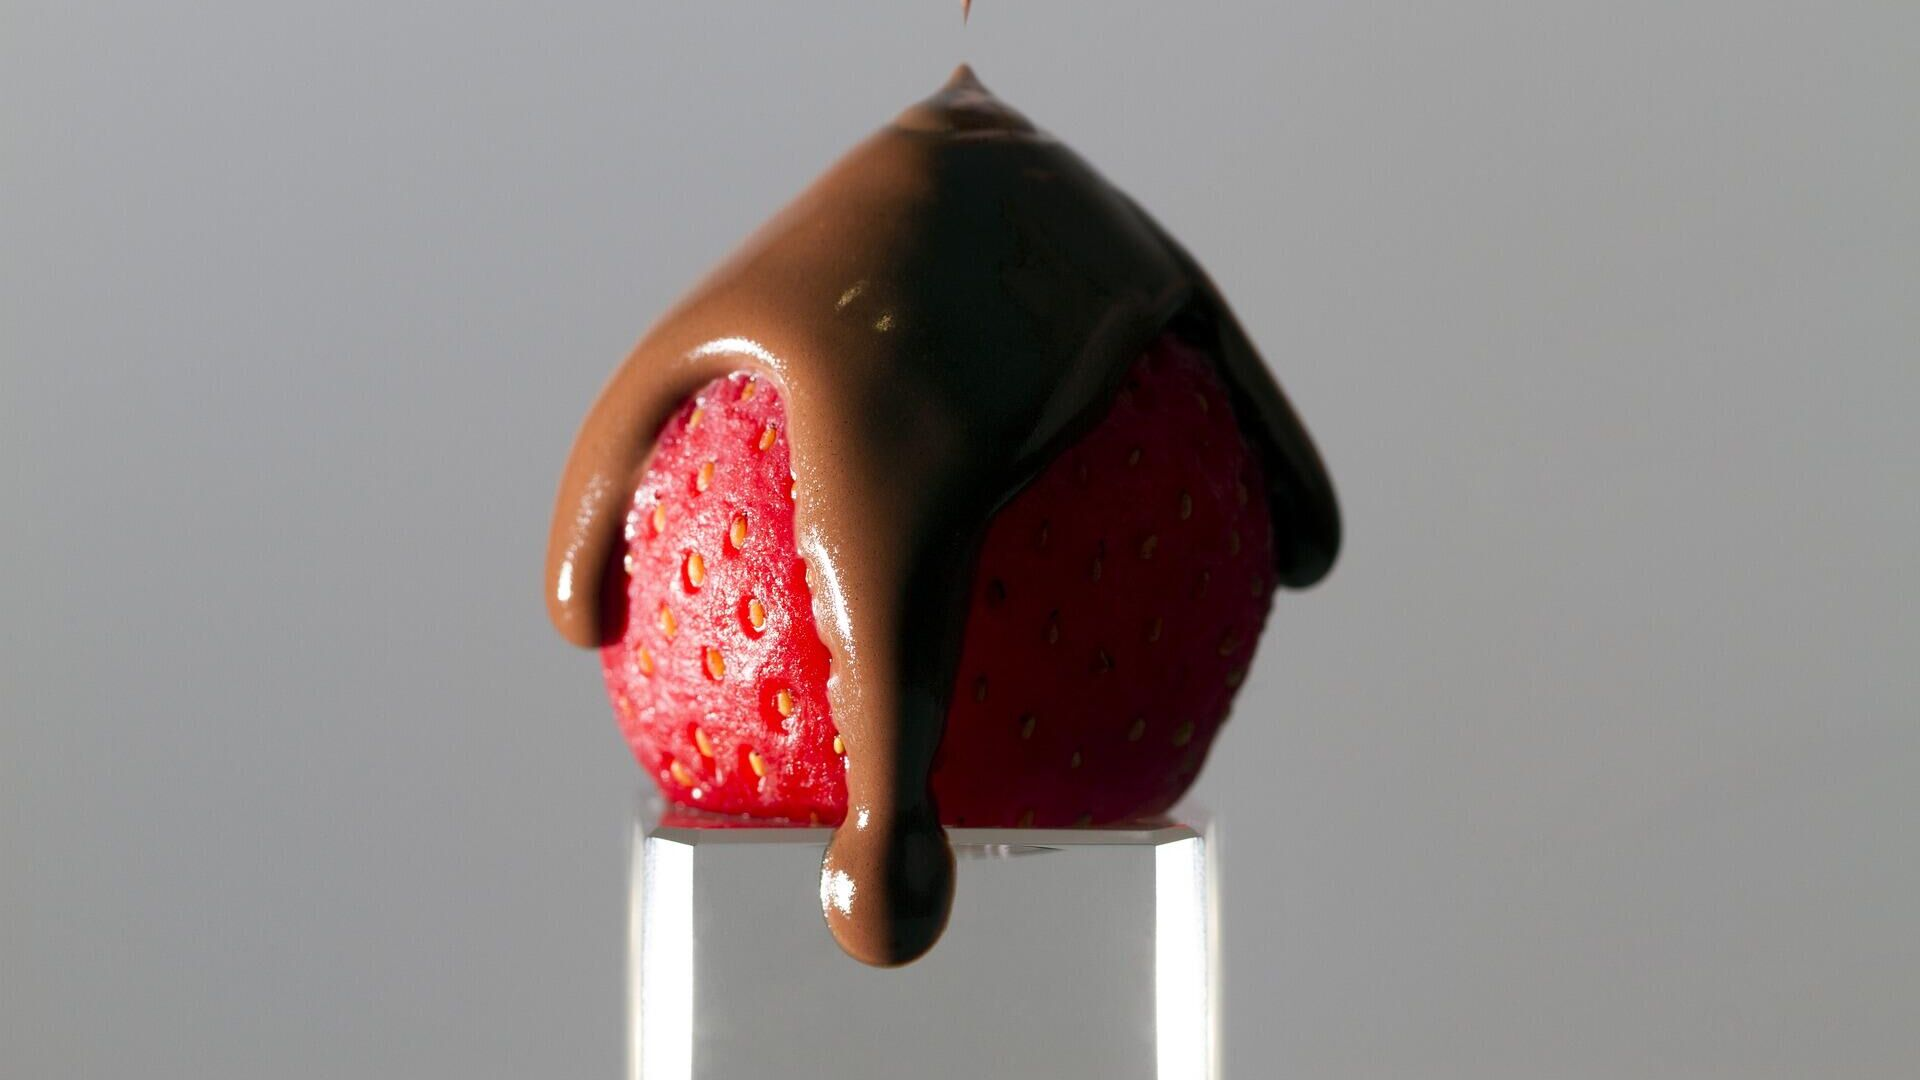 Una fresa con chocolate  - Sputnik Mundo, 1920, 31.03.2021